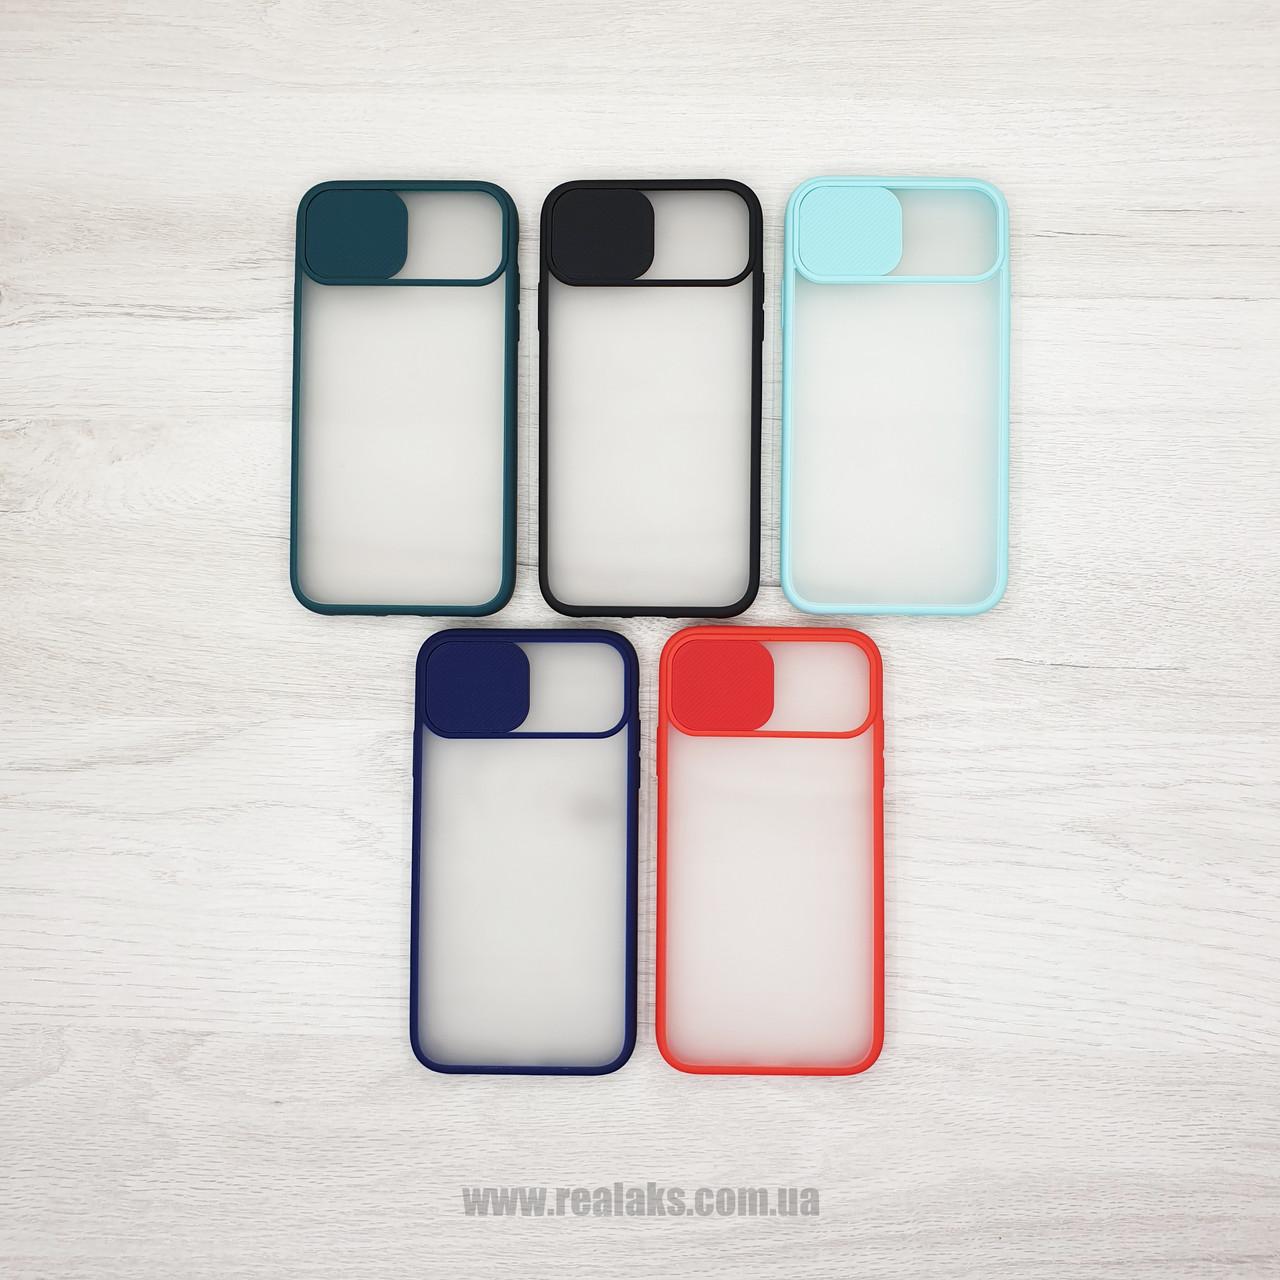 Чохол CASE для Apple iPhone X / XR / XS / XS Max (шторка на камеру) color